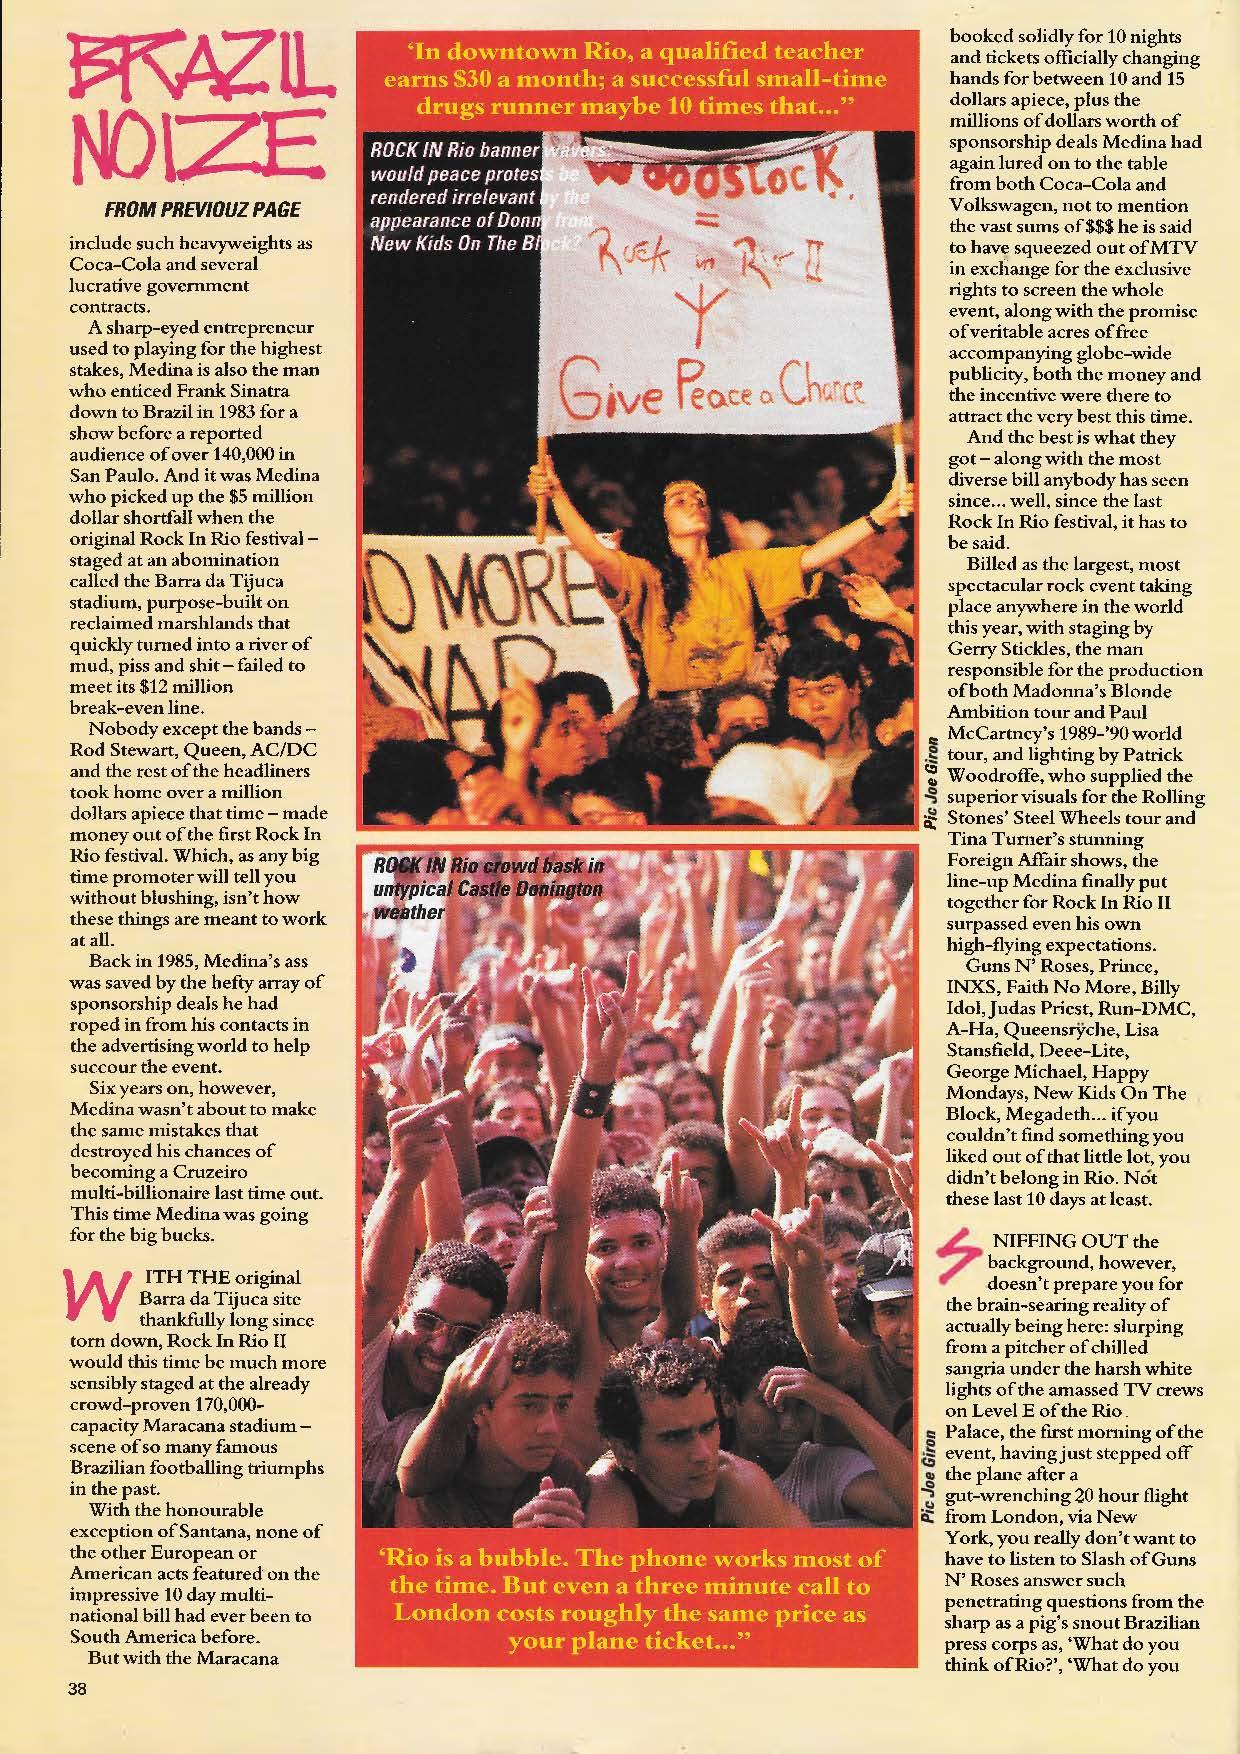 1991.02.09/16/23 - Kerrang - The Noize from Brazil (I, II, III) LpQjWSE8_o